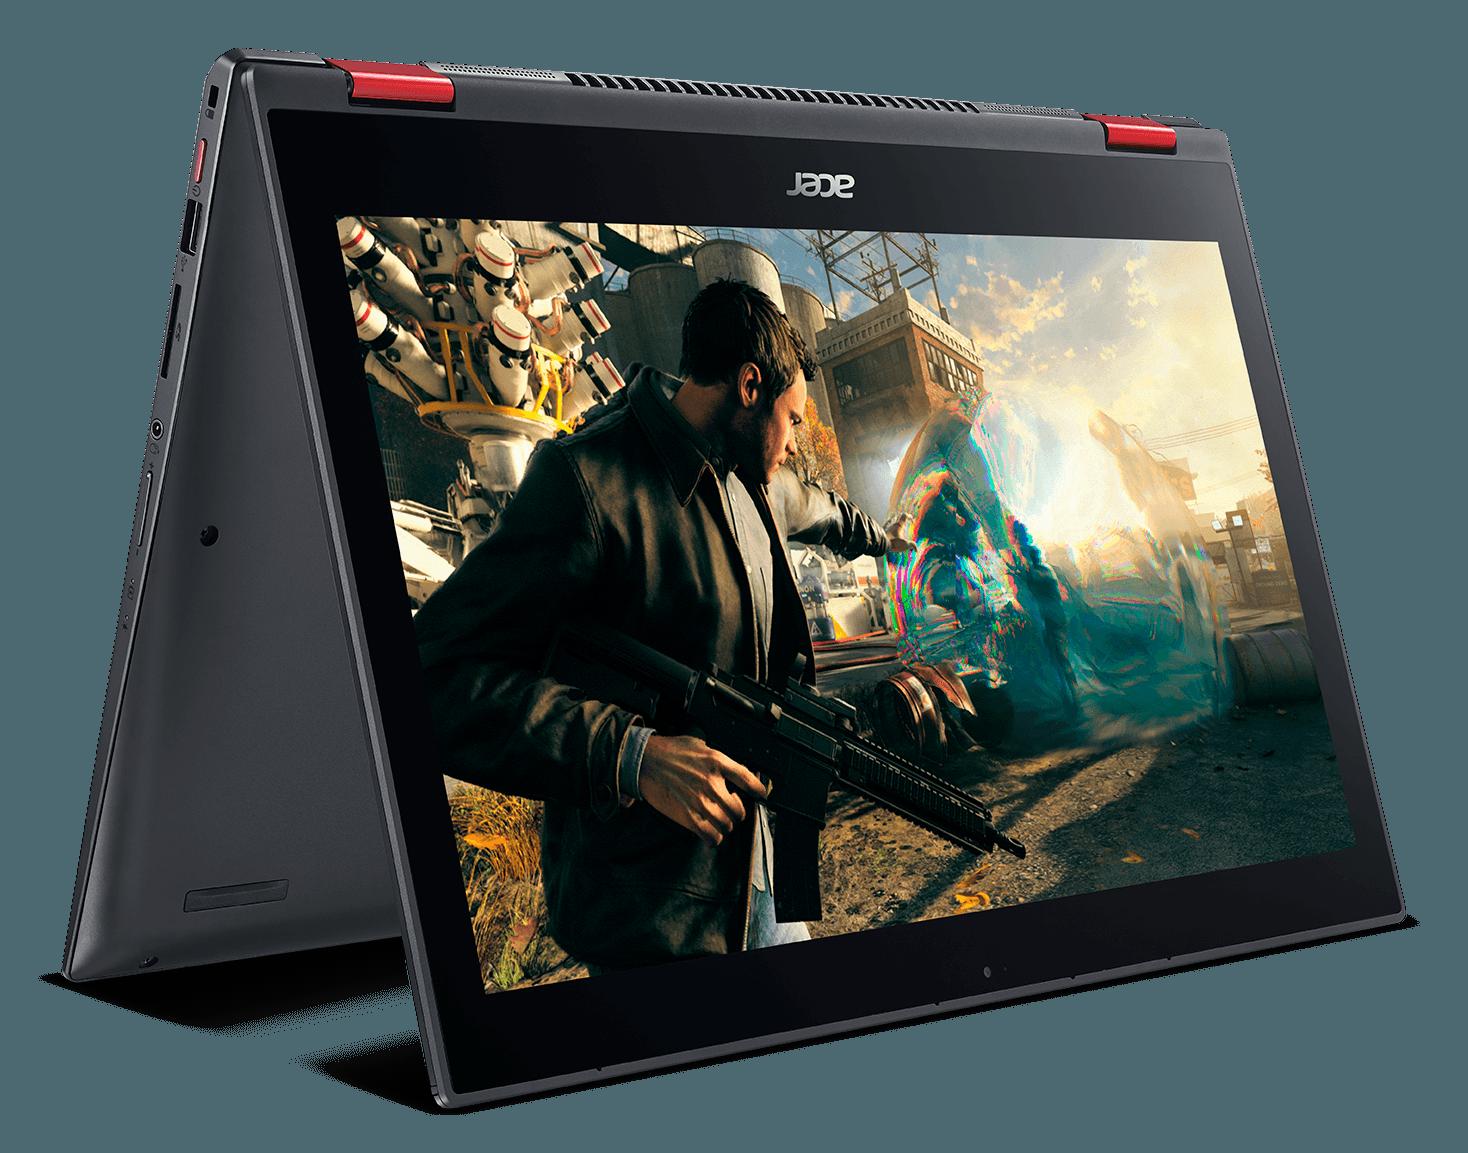 Acer выпустил игровой ультрабук-трансформер Nitro 5 Spin (AN NP515 51 wp win 07)